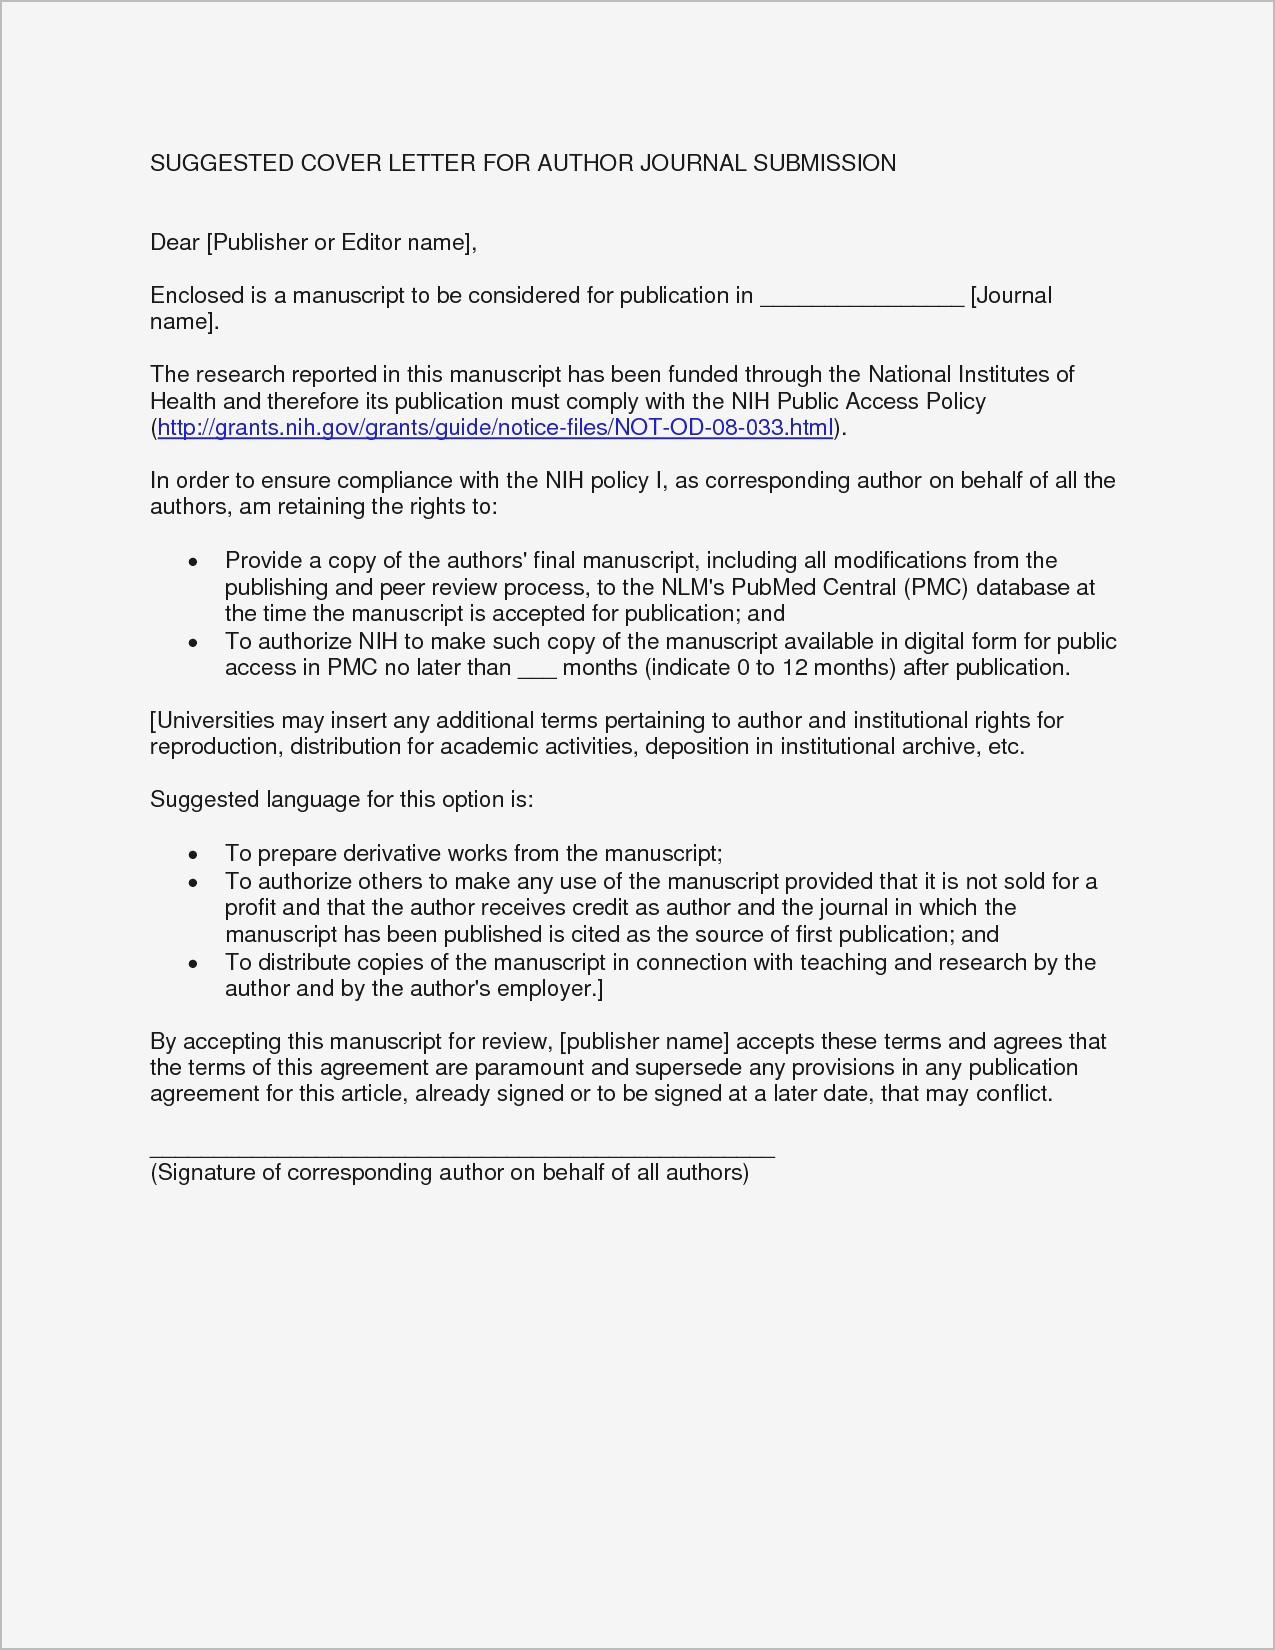 Final Demand Letter Template - Demand Letter Sample Inspirational Sample Demand Letter for Money